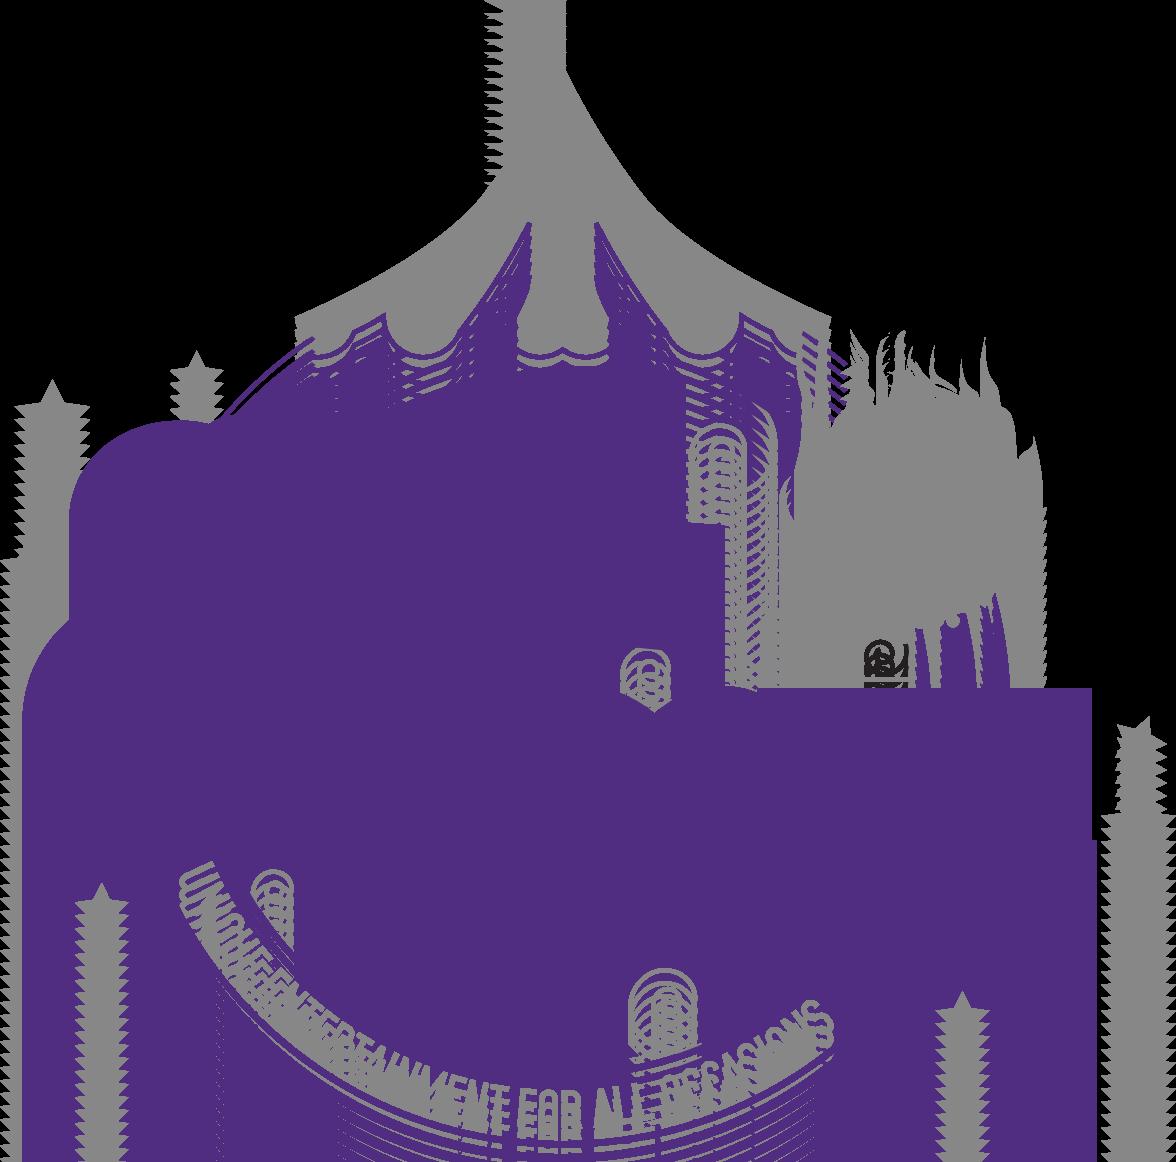 Soul Cirque